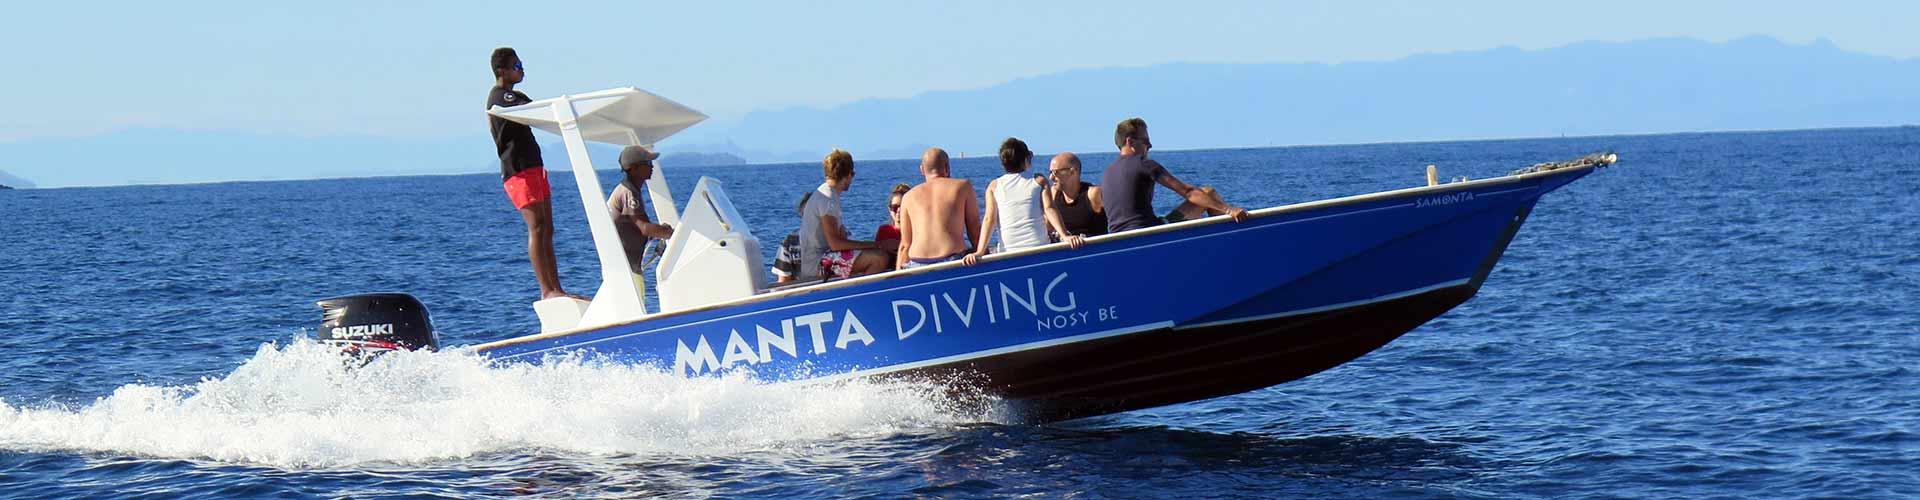 Manta Diving - Escursioni